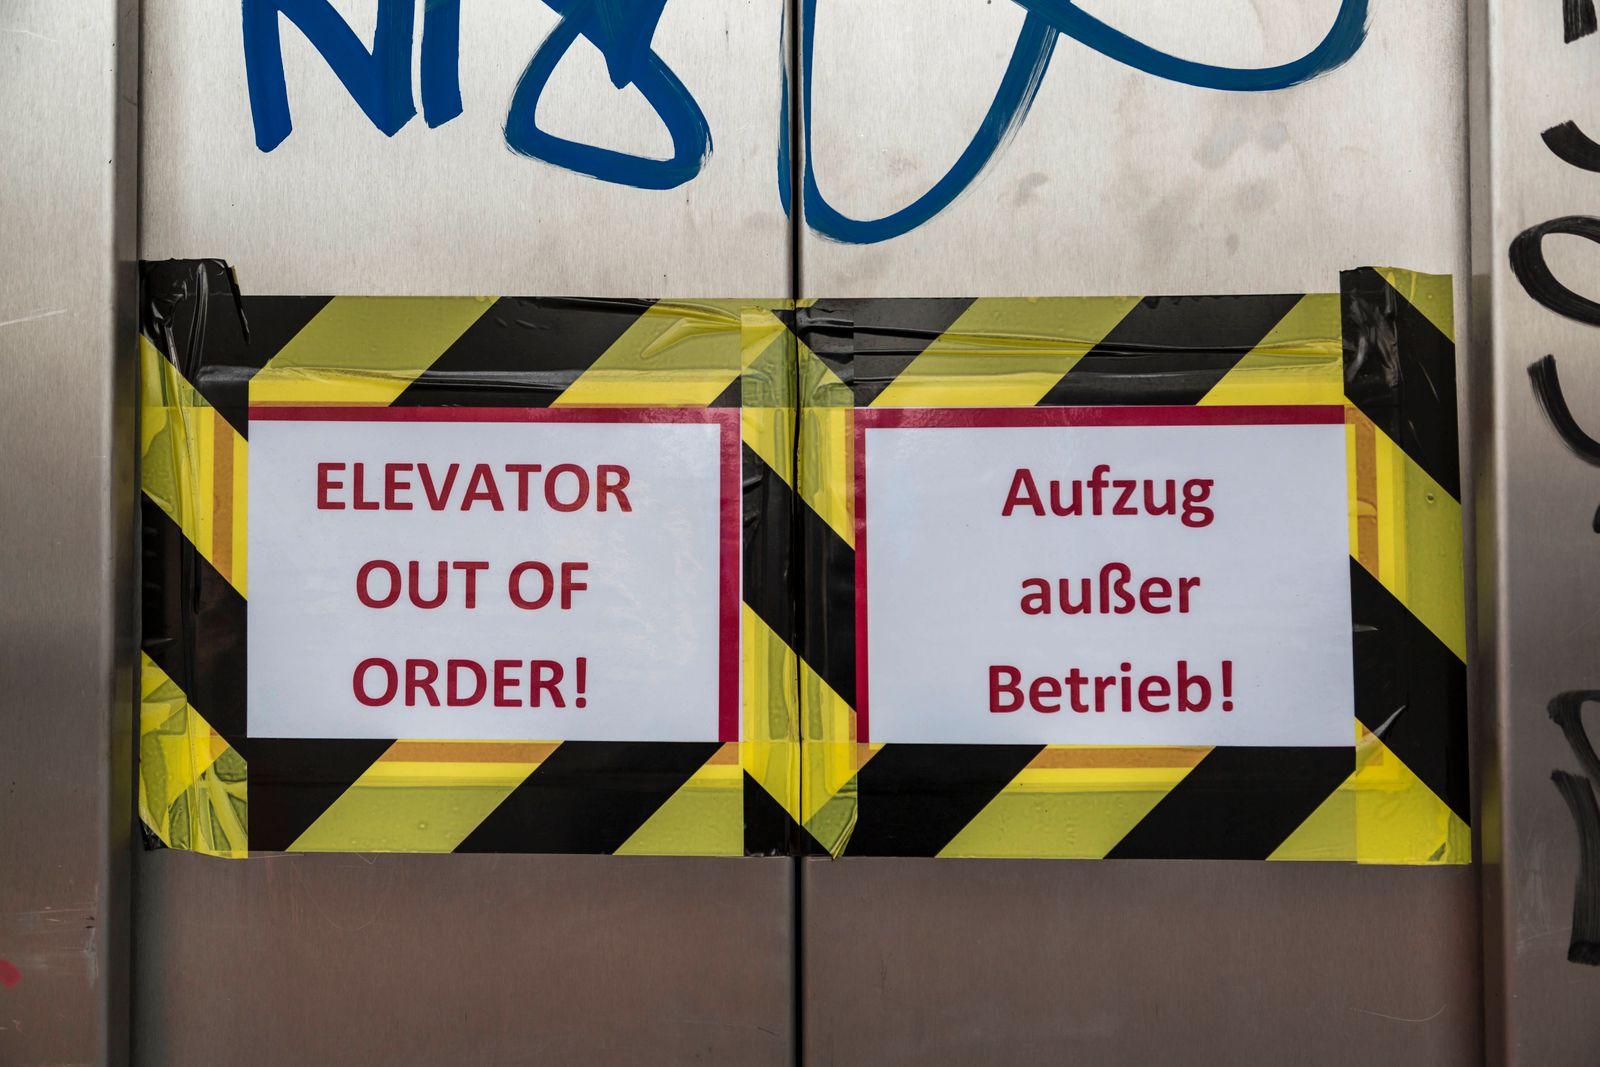 Fahrstuhl außer Betrieb Schild in Berlin *** Elevator out of order Sign in Berlin